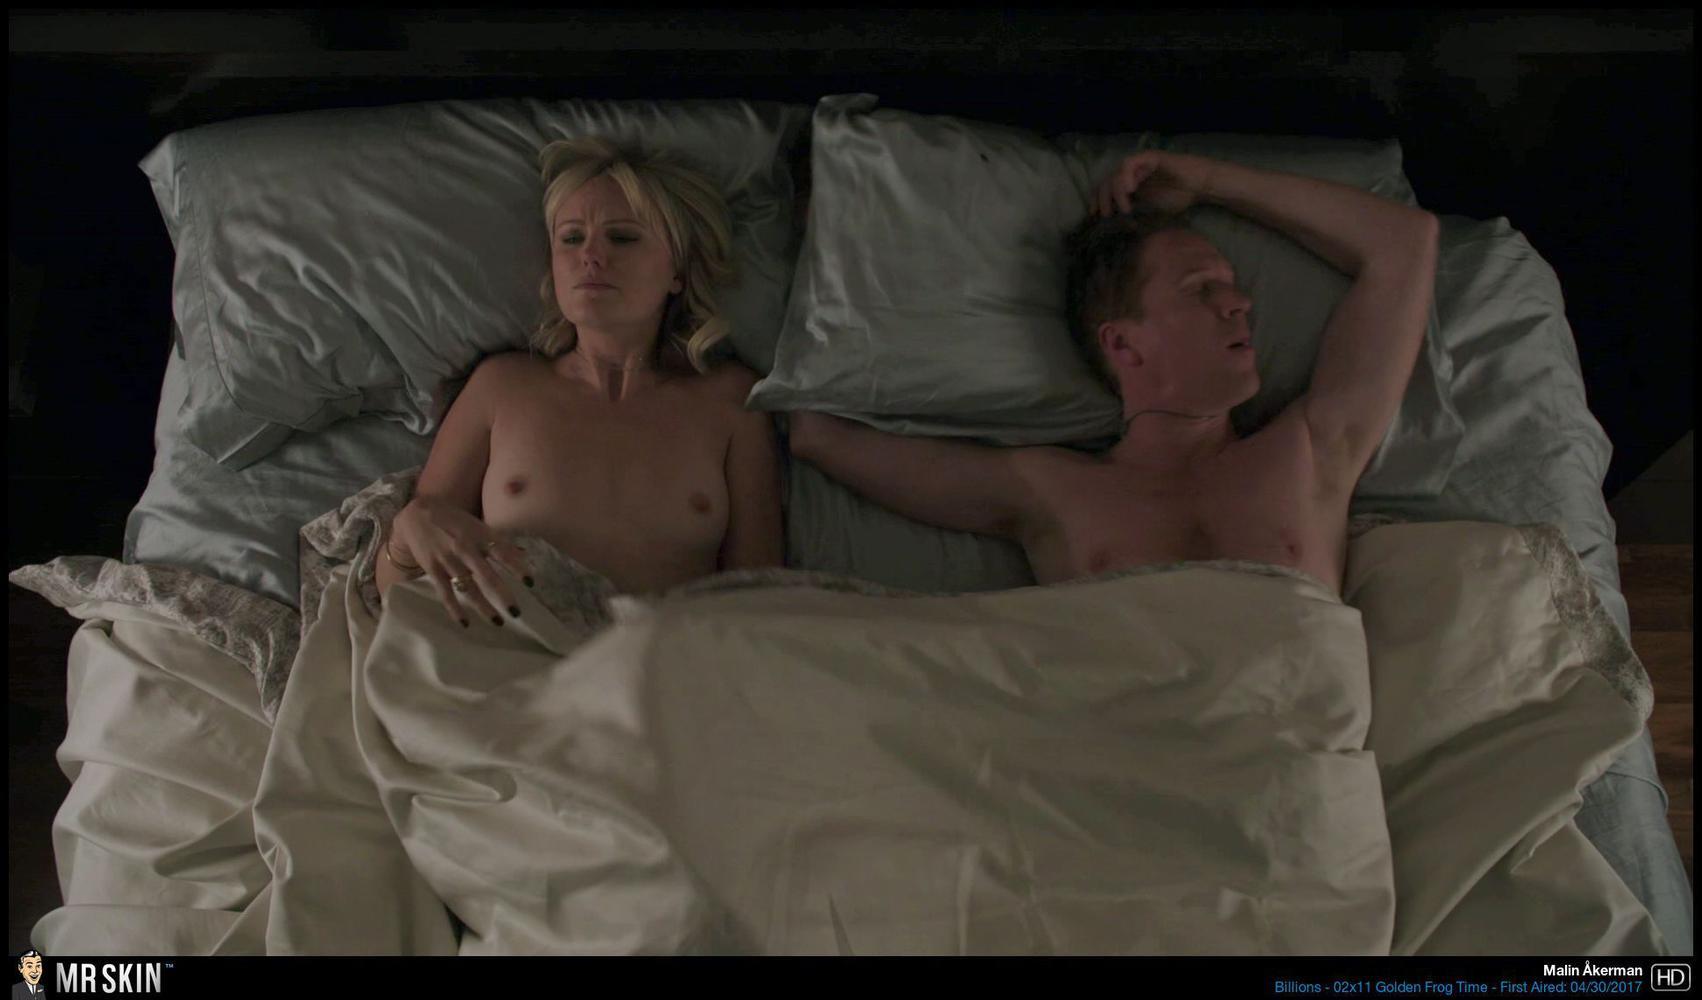 pajama bottoms pussy hole nude